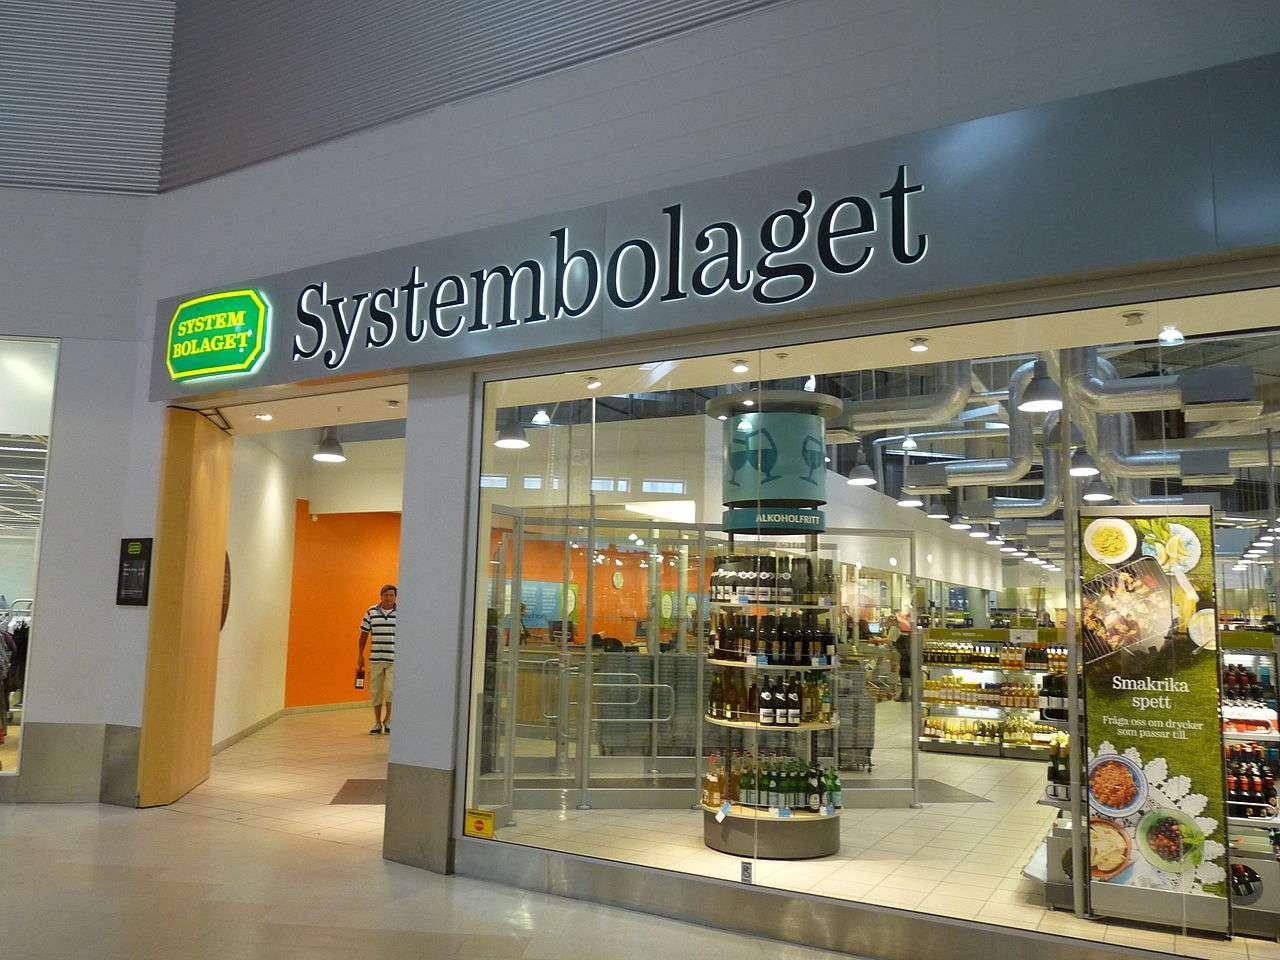 Systemolaget